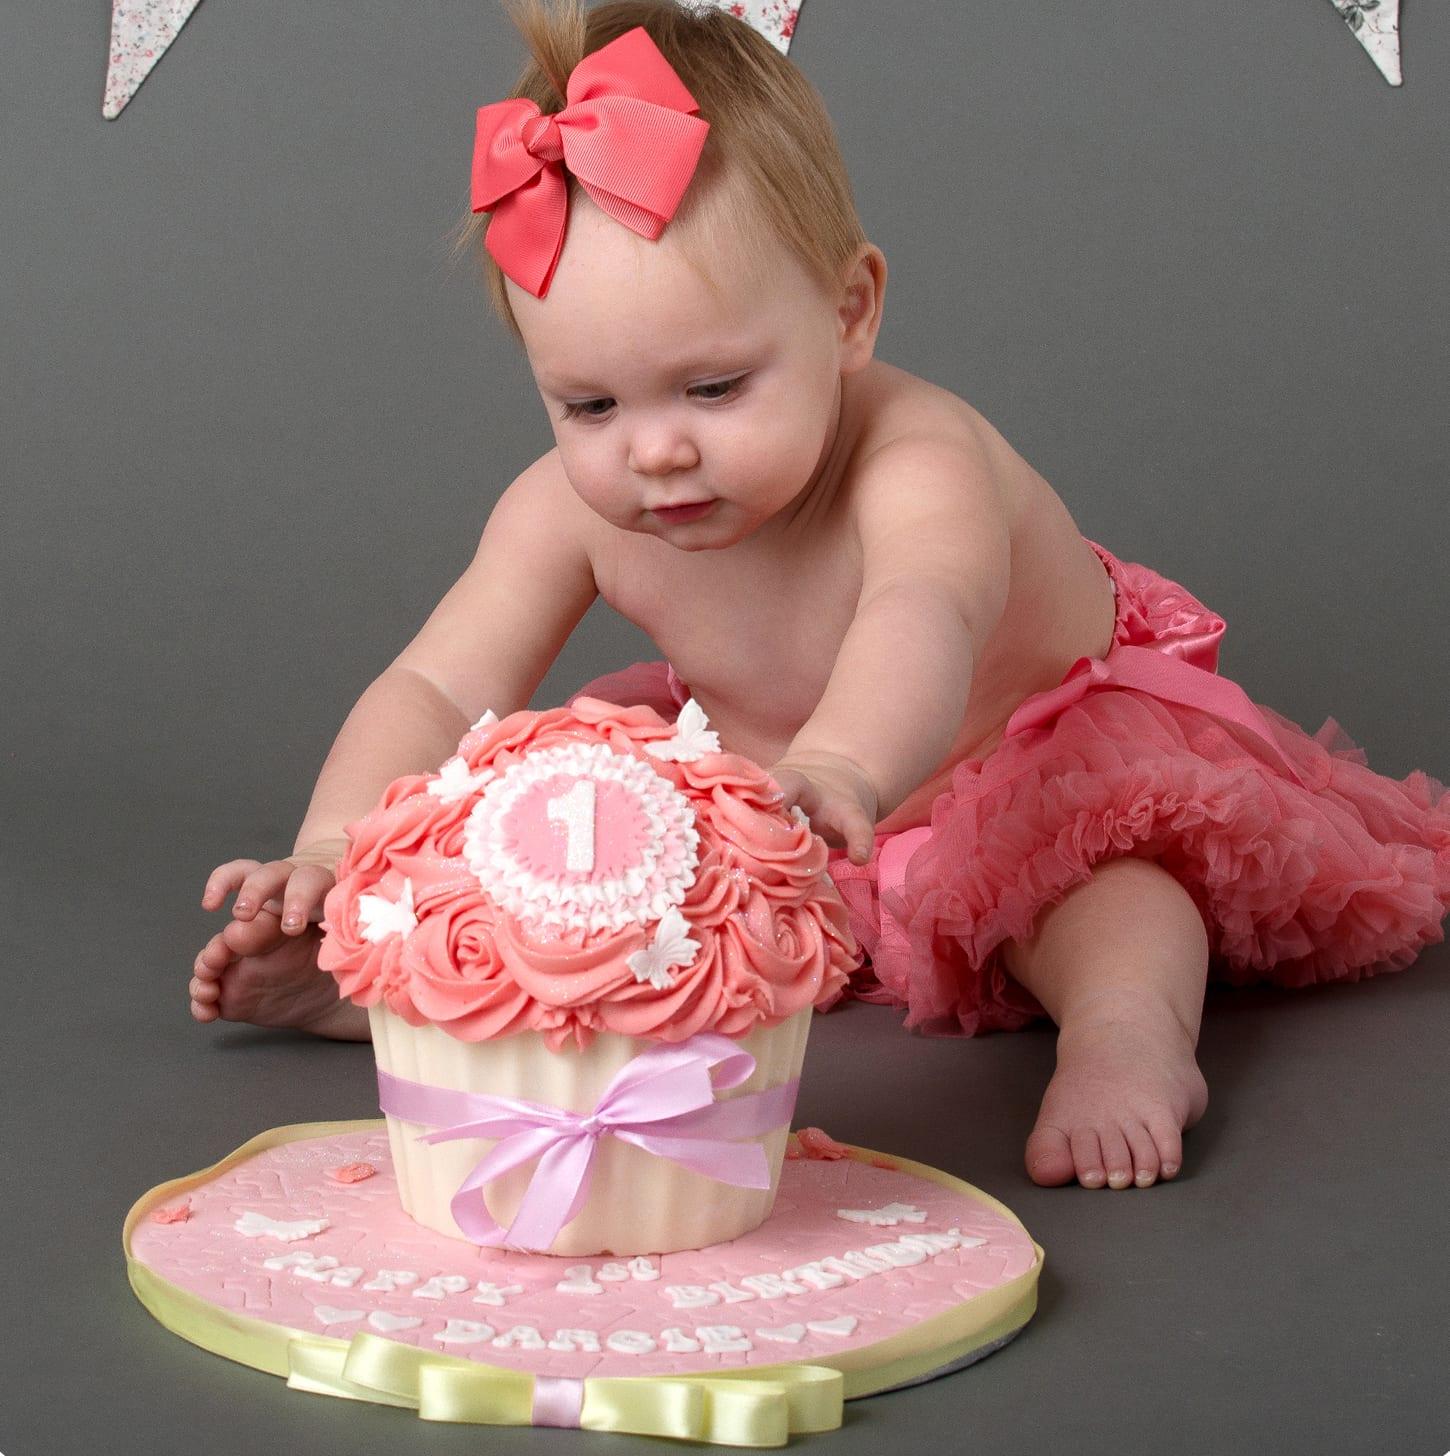 Cake-Smash-Template